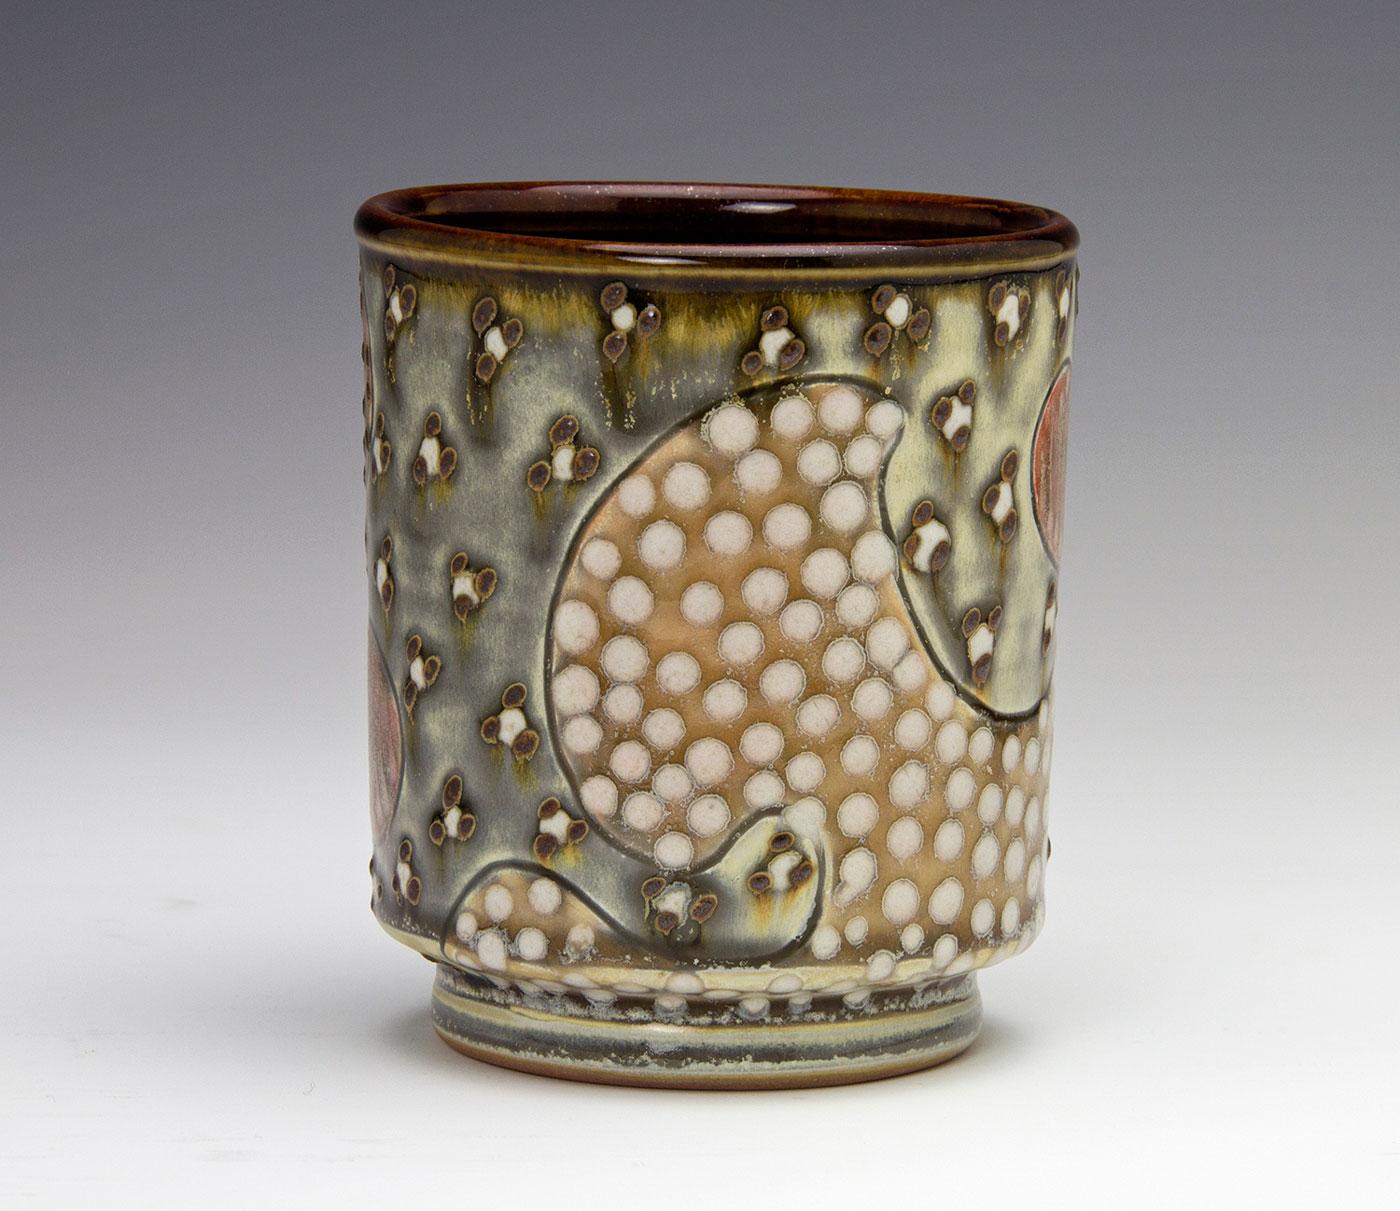 Pattern-Medley-studio-art-cup-Samantha-Henneke-Bulldog-Pottery-North-Carolina.jpg